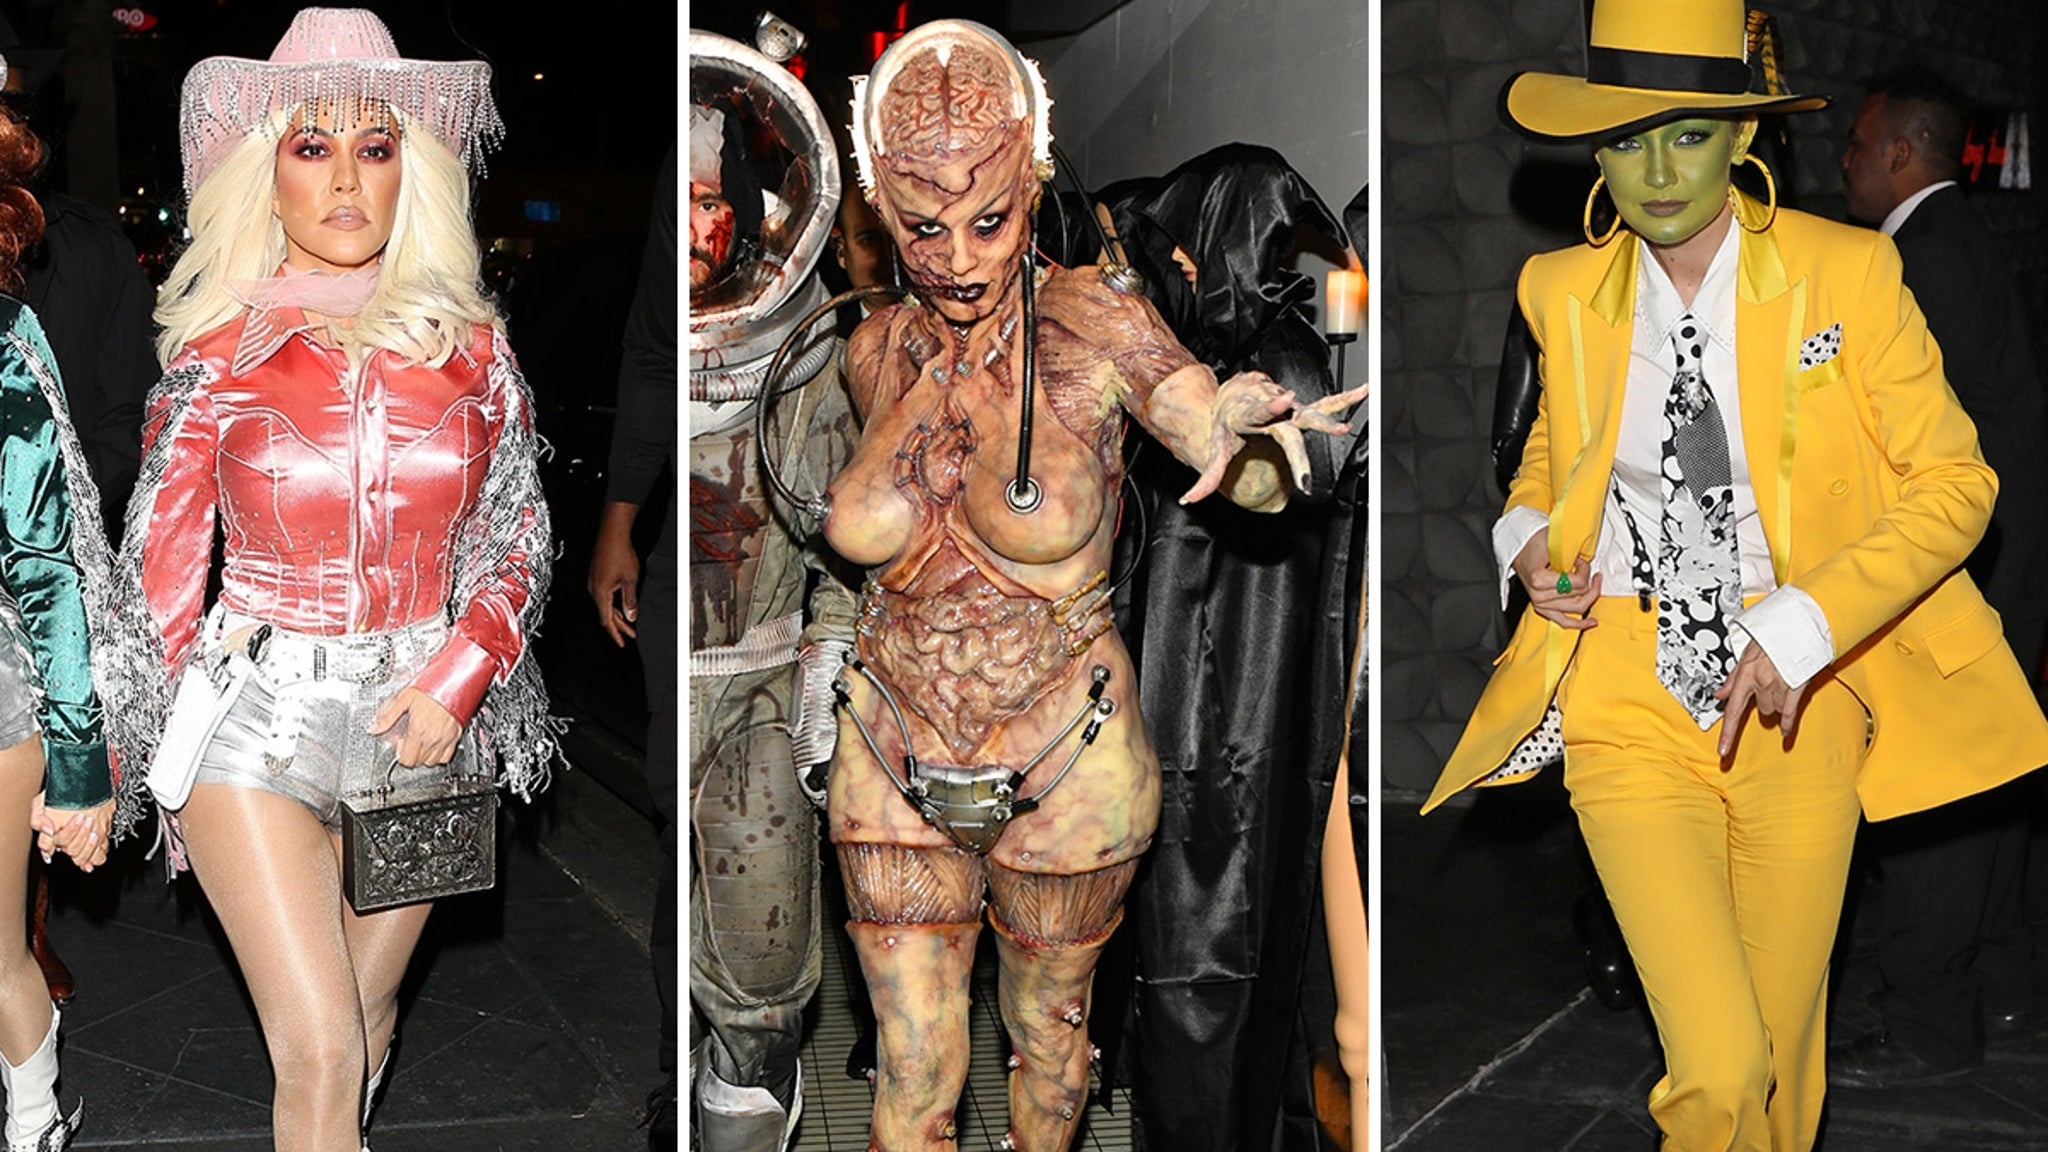 Coco Austin Halloween Costume 2020 Heidi Klum Reveals Costume as Celebs Go All Out for Halloween